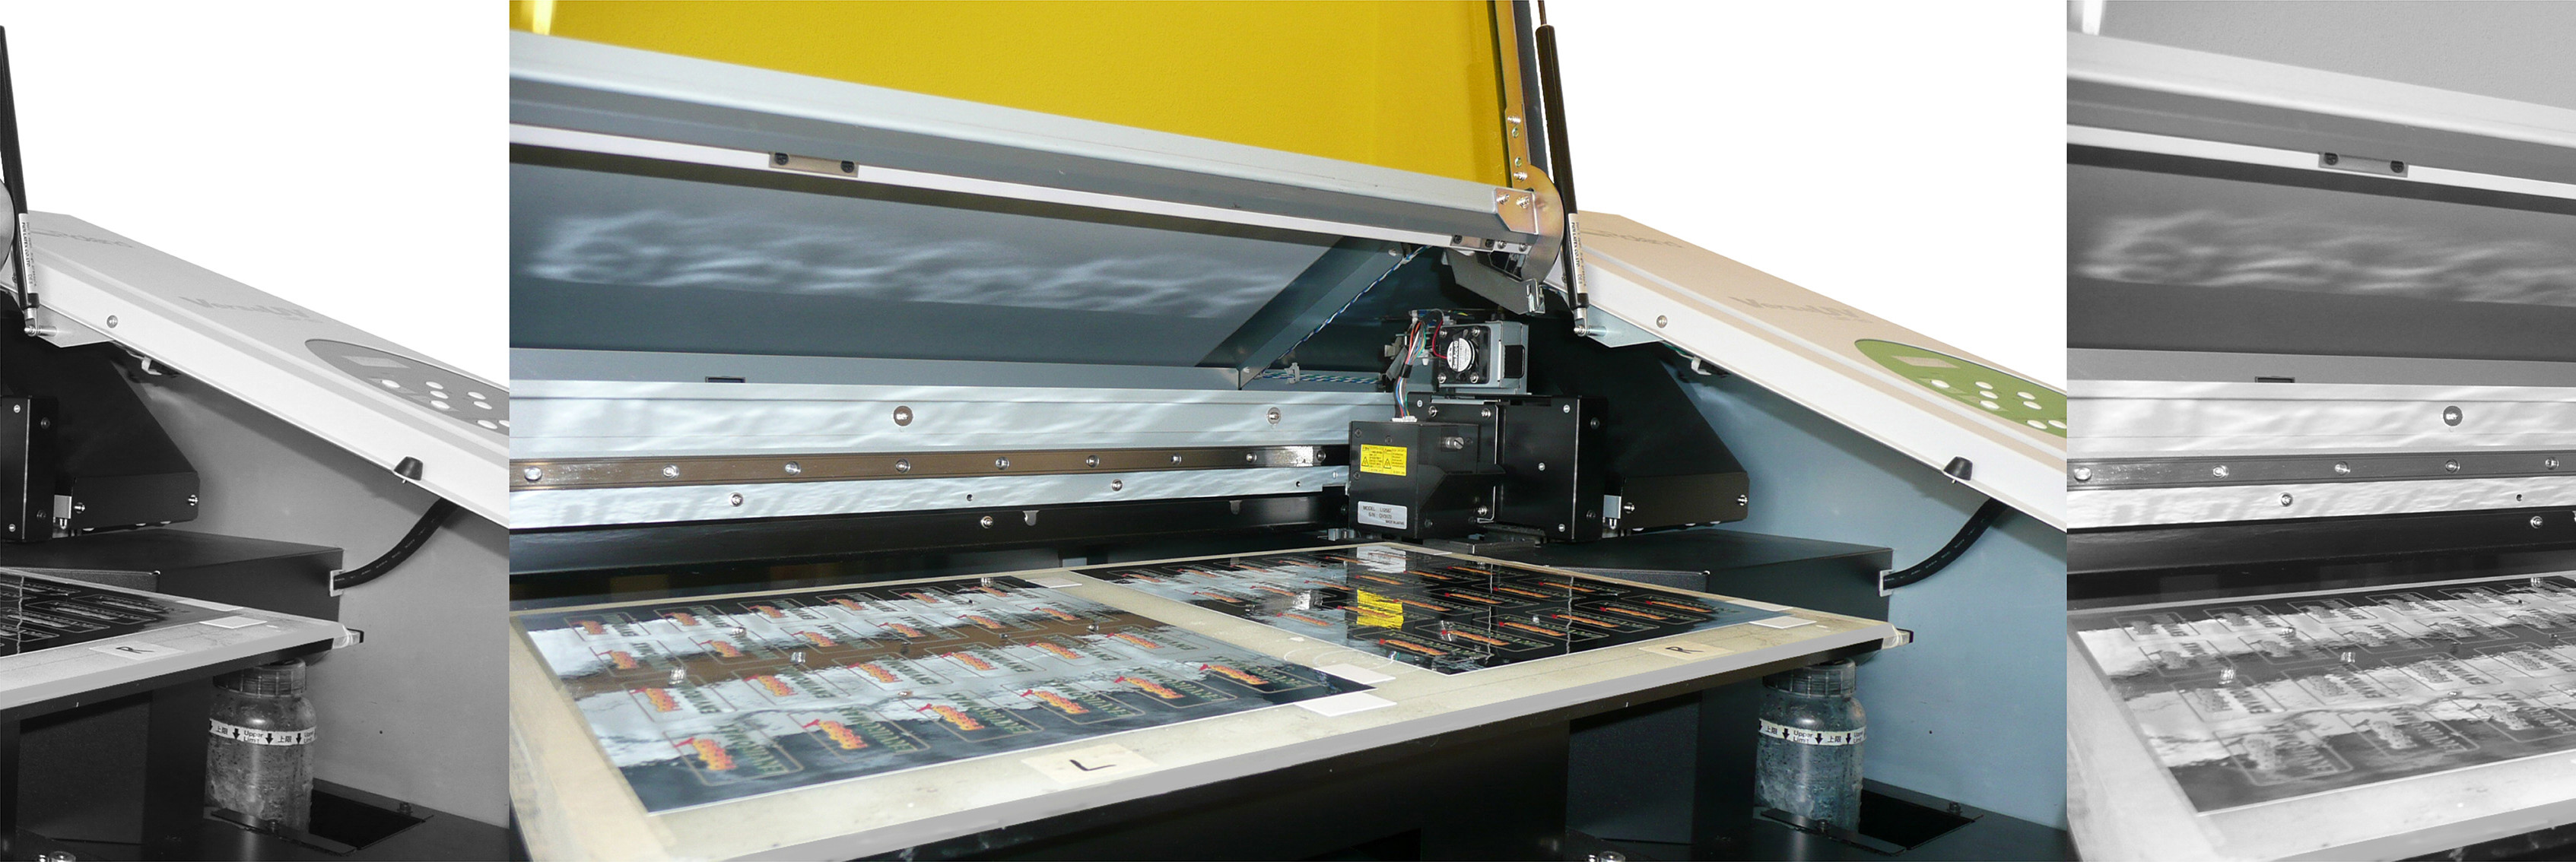 Flatbed digital printing